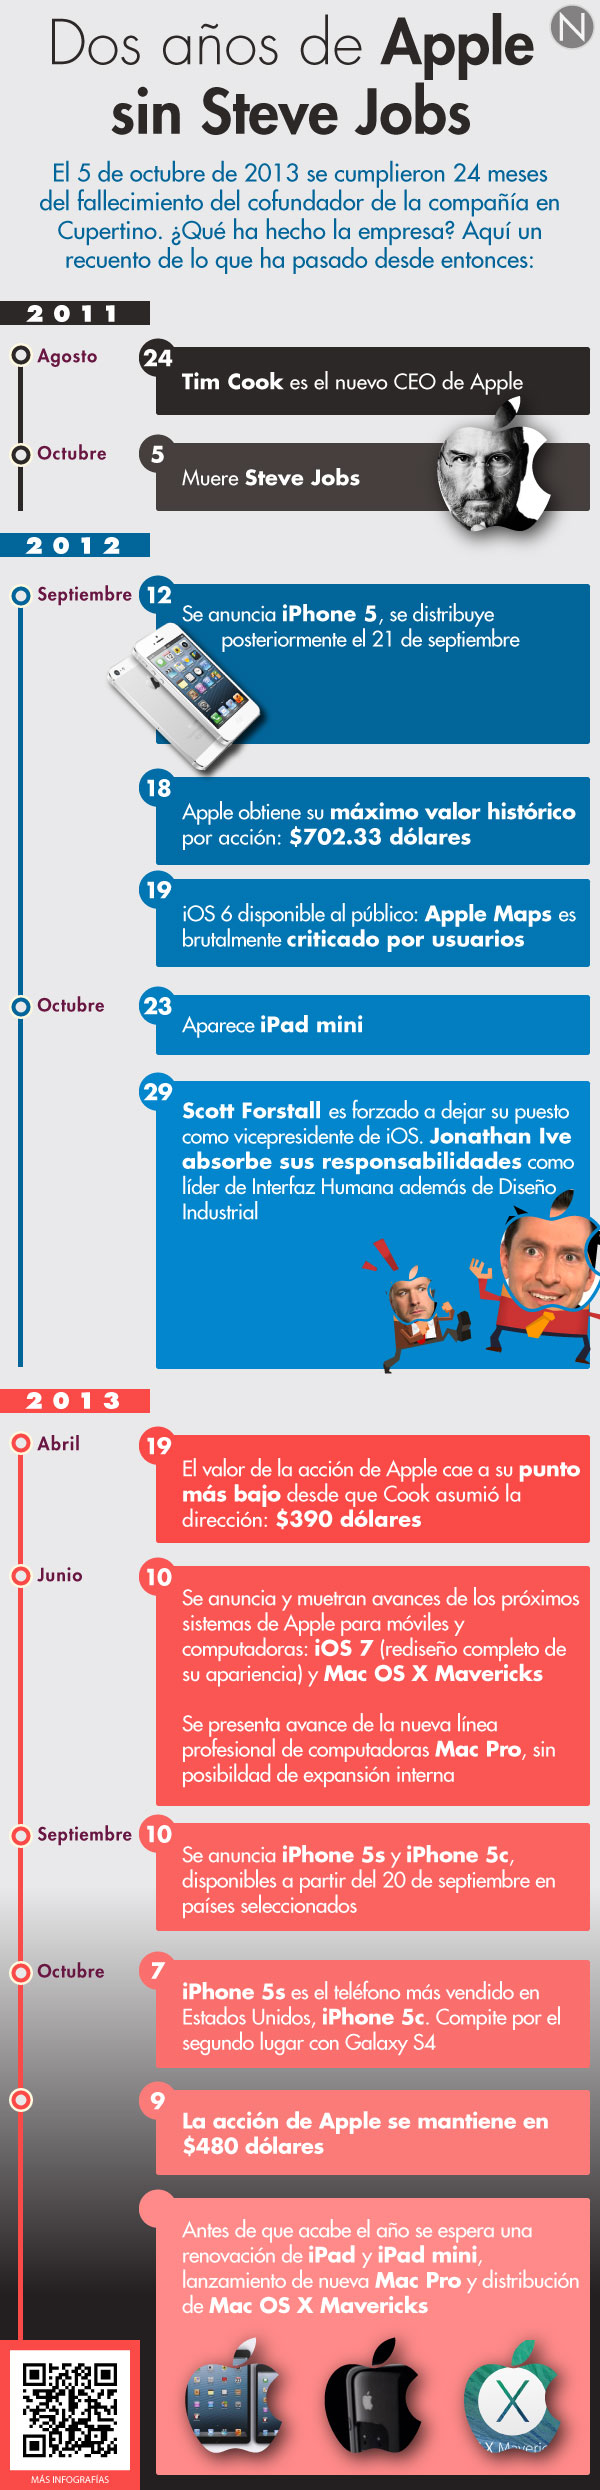 2 años de Apple sin Steve Jobs